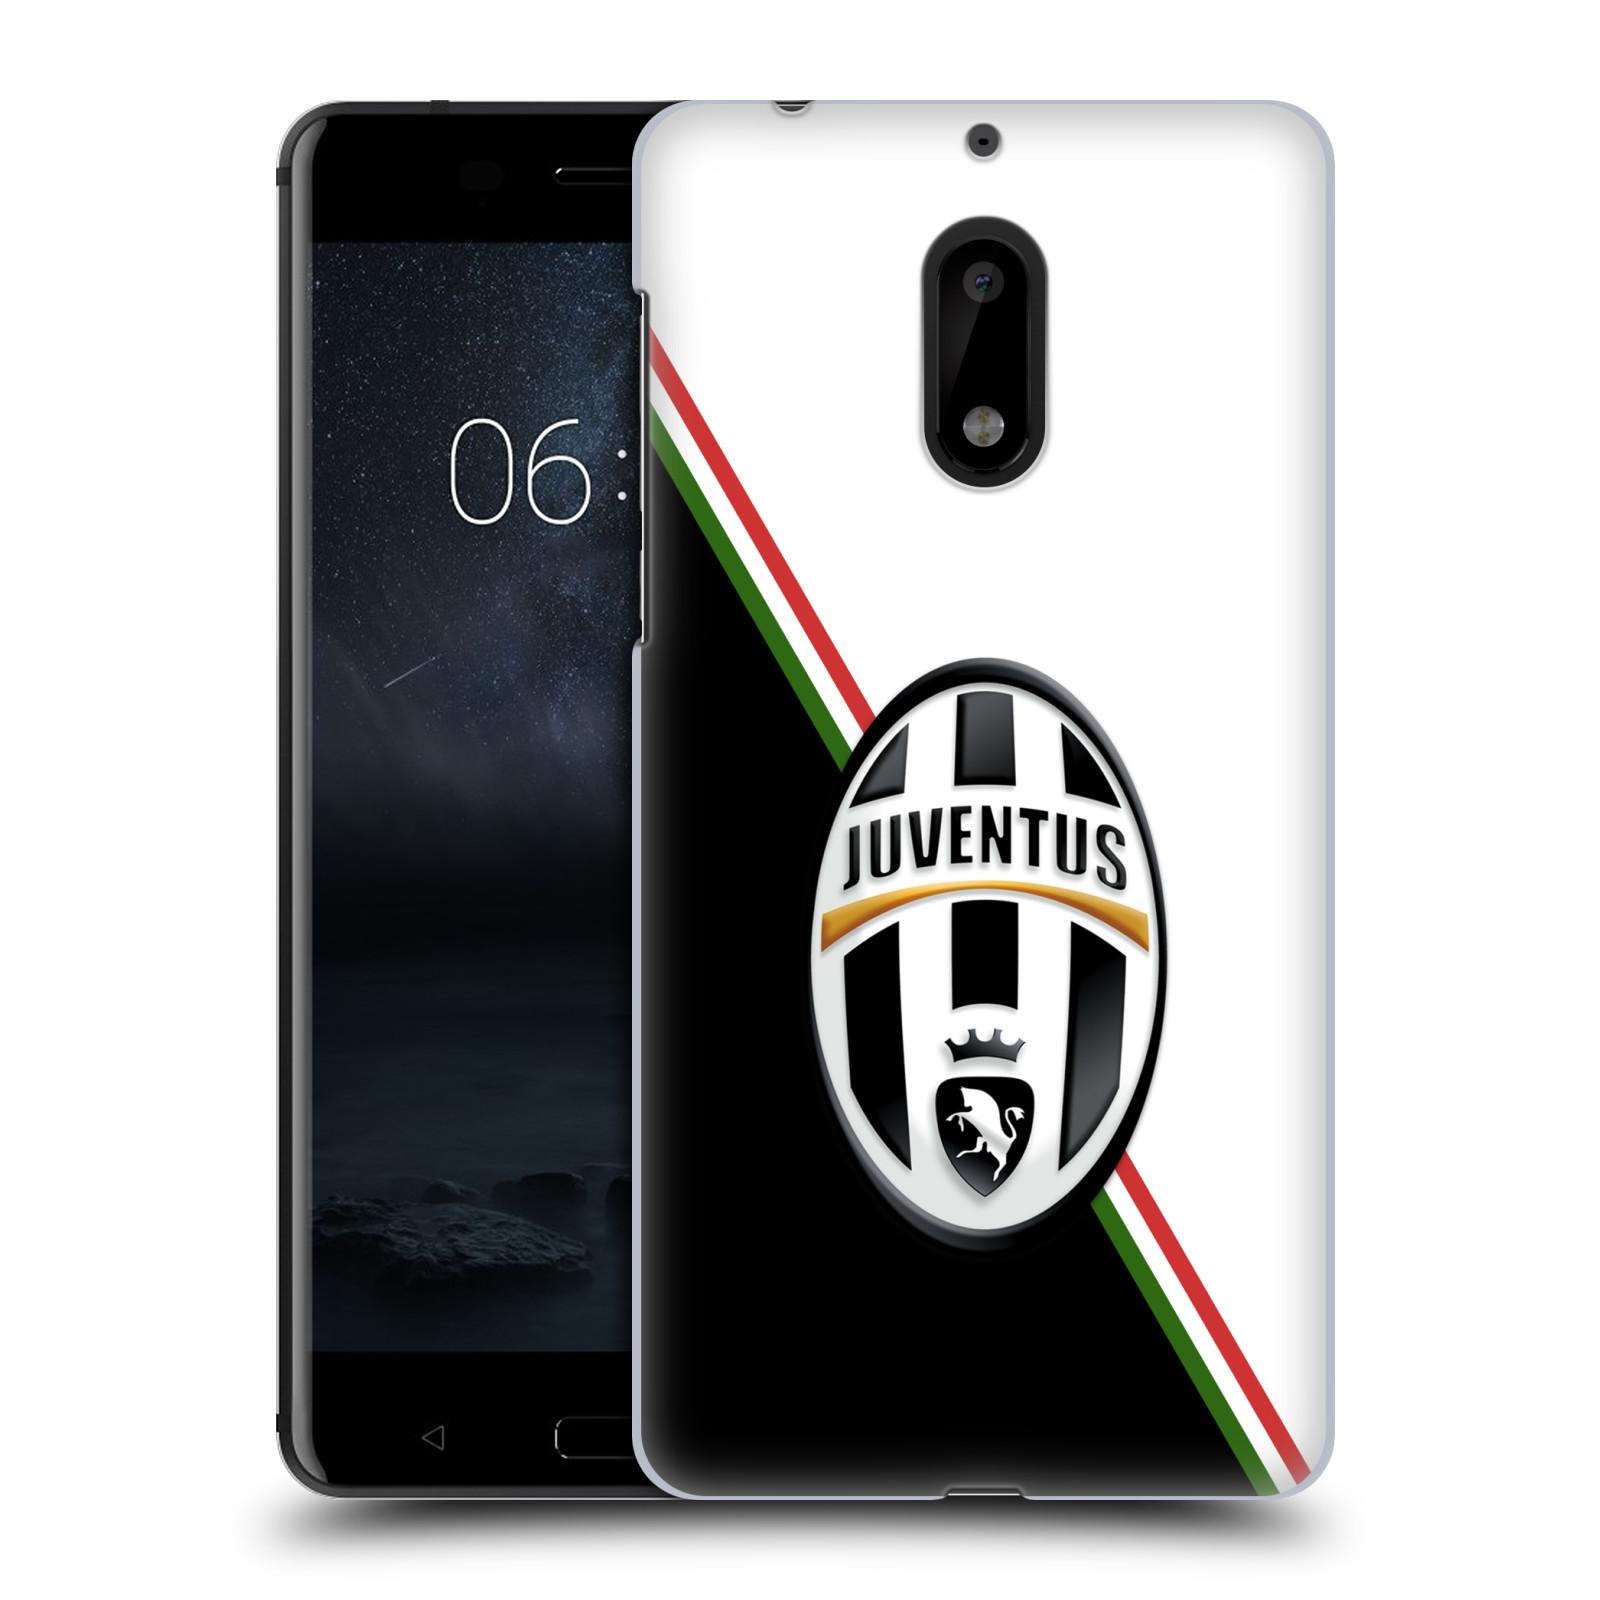 Plastové pouzdro na mobil Nokia 6 - Head Case Juventus FC - Black and White (Plastový kryt či obal na mobilní telefon Juventus FC Official pro Nokia 6 (Dual SIM))